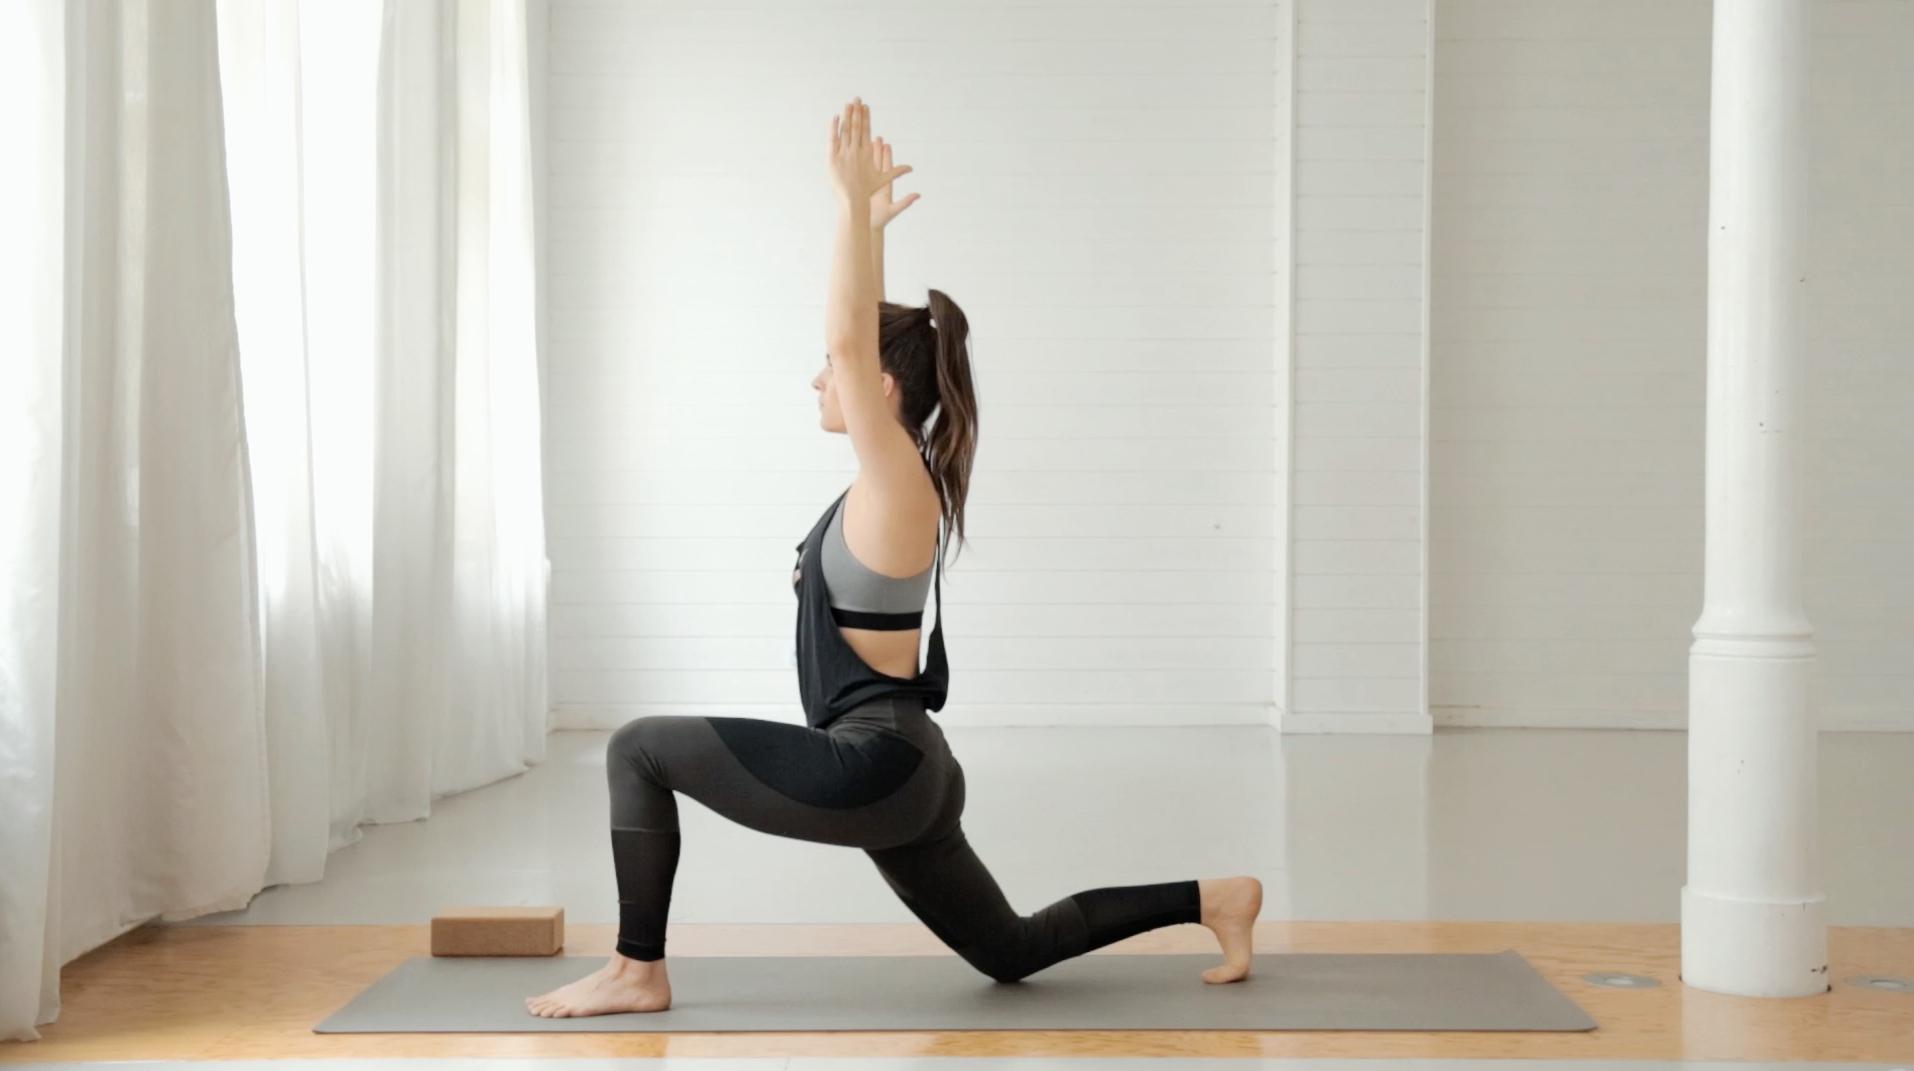 beine-po-booty-yoga-mady-morrison-11